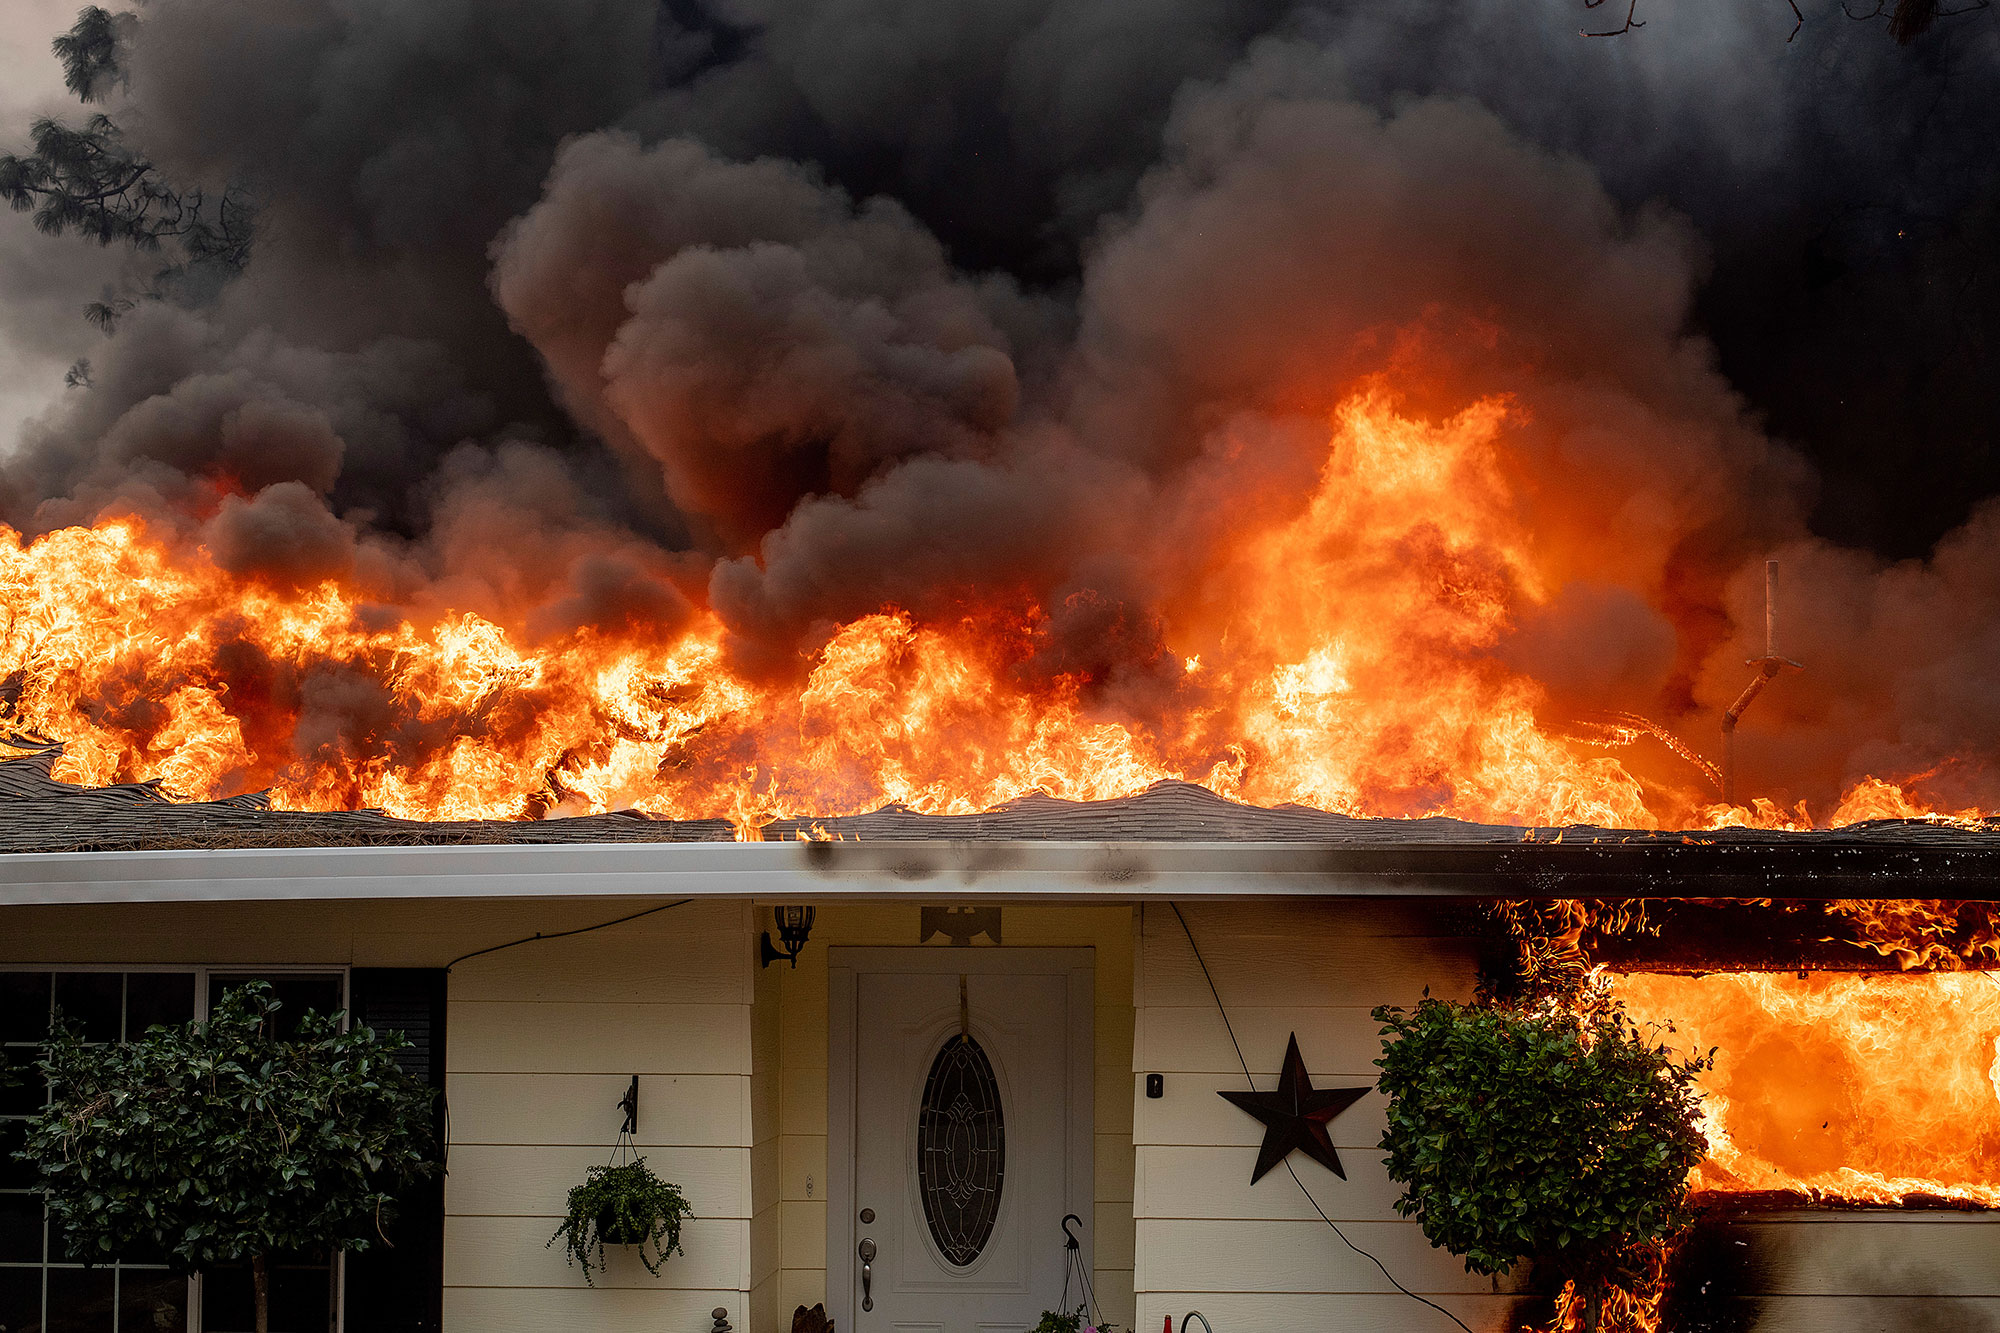 <div class='meta'><div class='origin-logo' data-origin='none'></div><span class='caption-text' data-credit='Noah Berger/AP Photo'>Flames consume a home as the Camp Fire tears through Paradise, Calif., on Thursday, Nov. 8, 2018.</span></div>